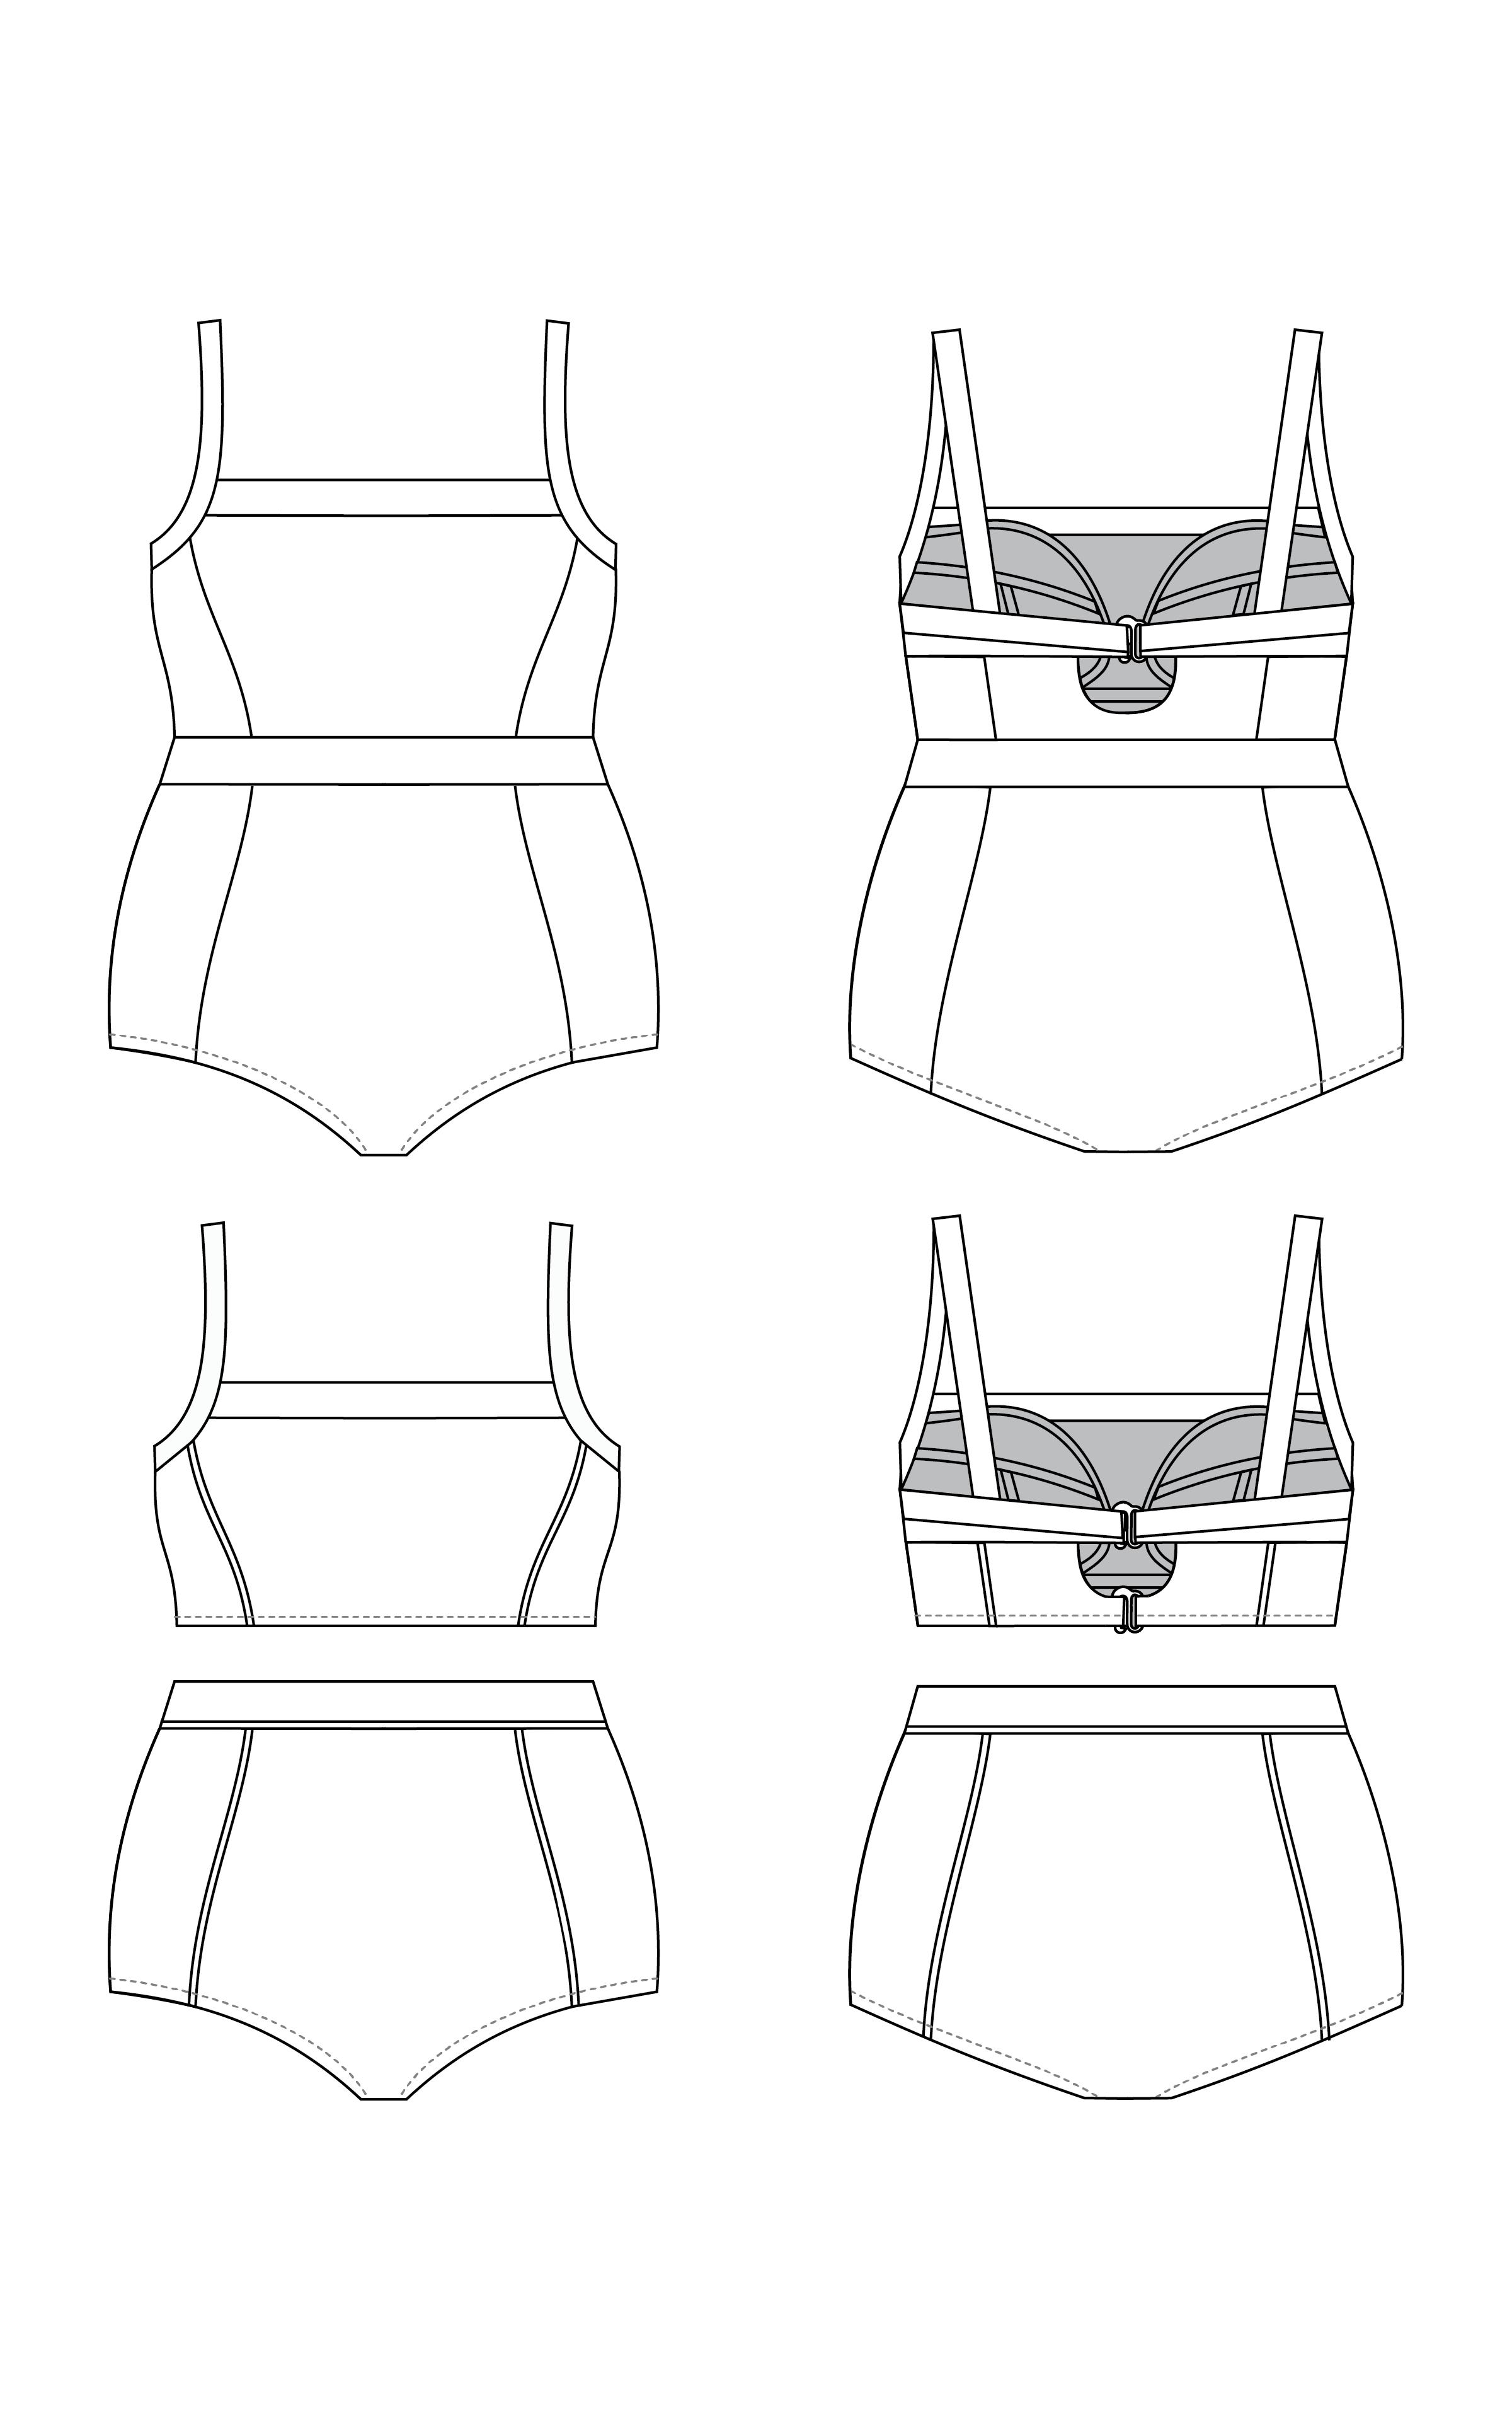 Ipswich Swimsuit Printed Pattern   Ipswich Swimsuit   Pinterest ...